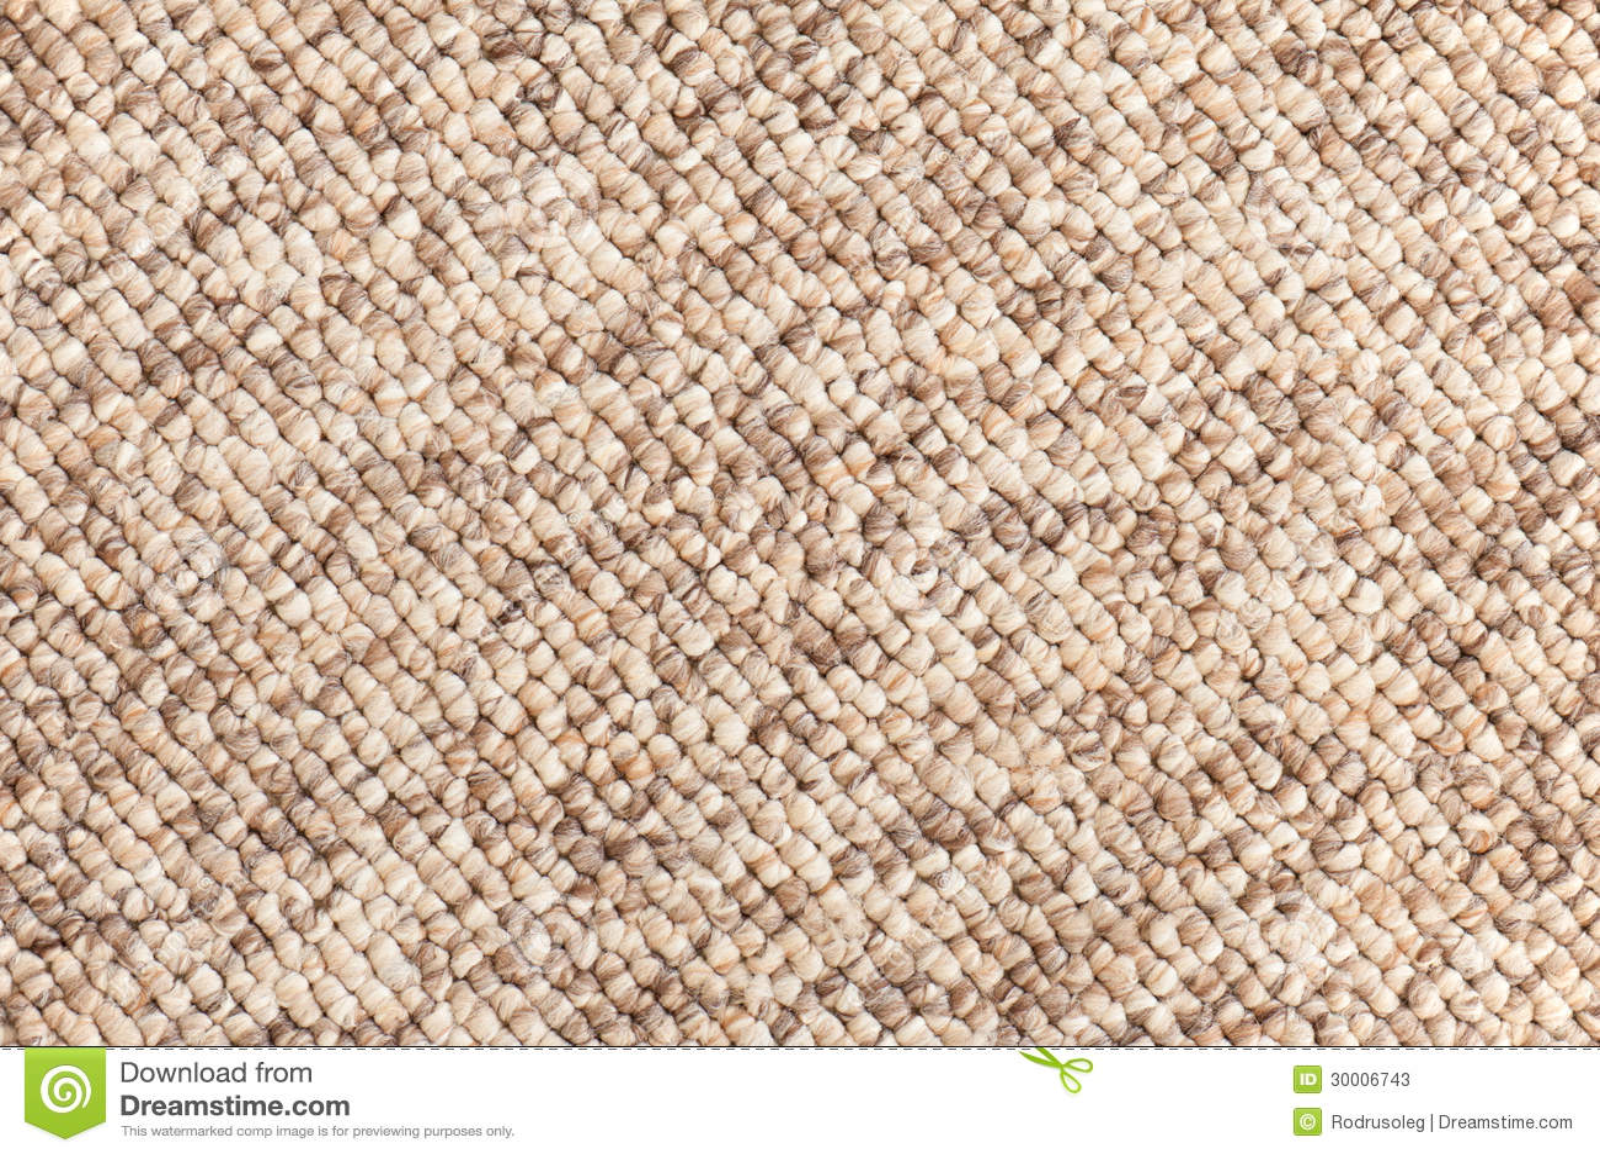 Beige Brown Carpet Texture Stock Photos Image 30006743